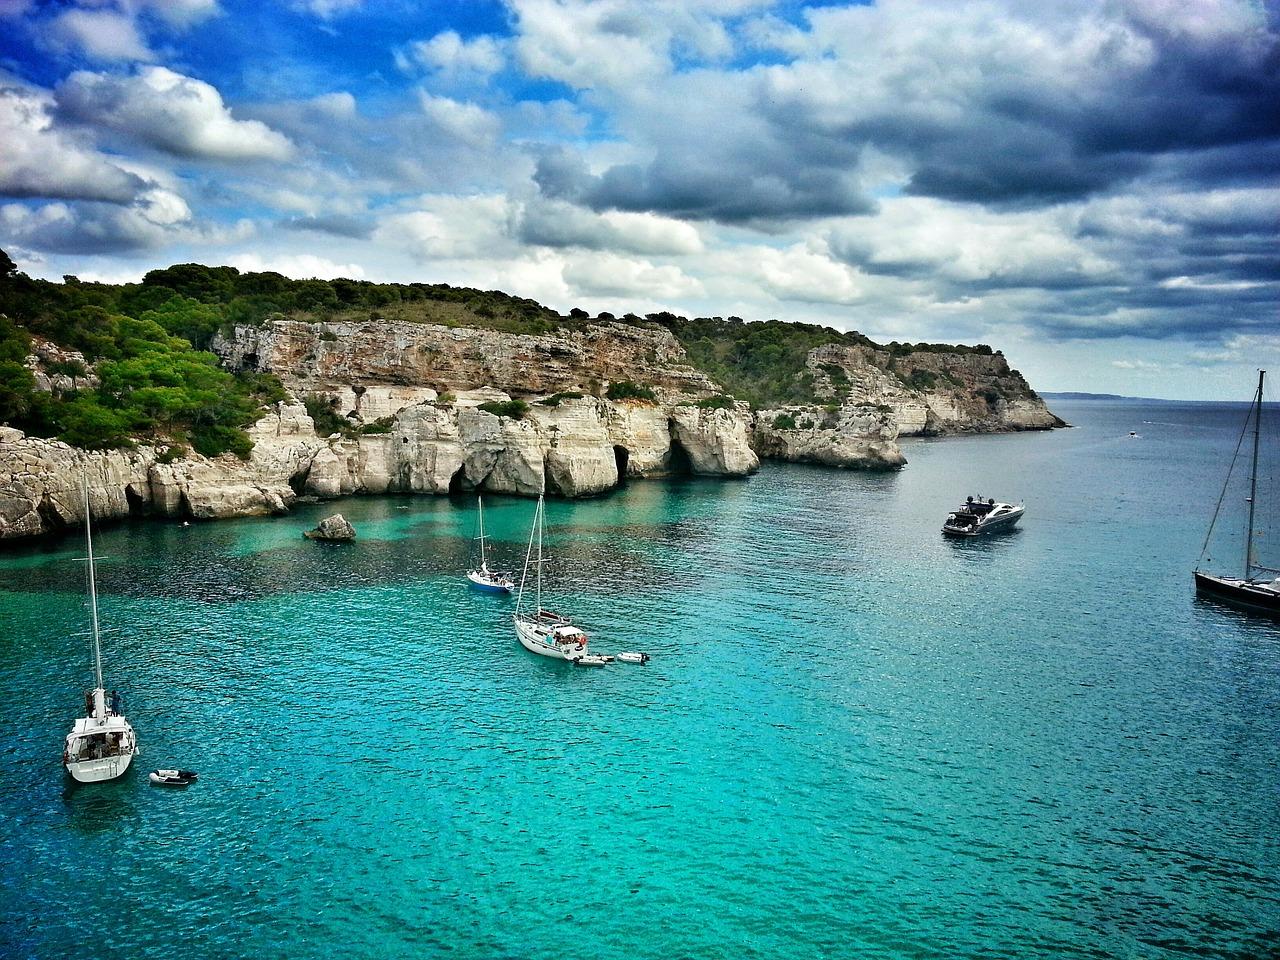 Menorca - The Safe Haven For European Tourists